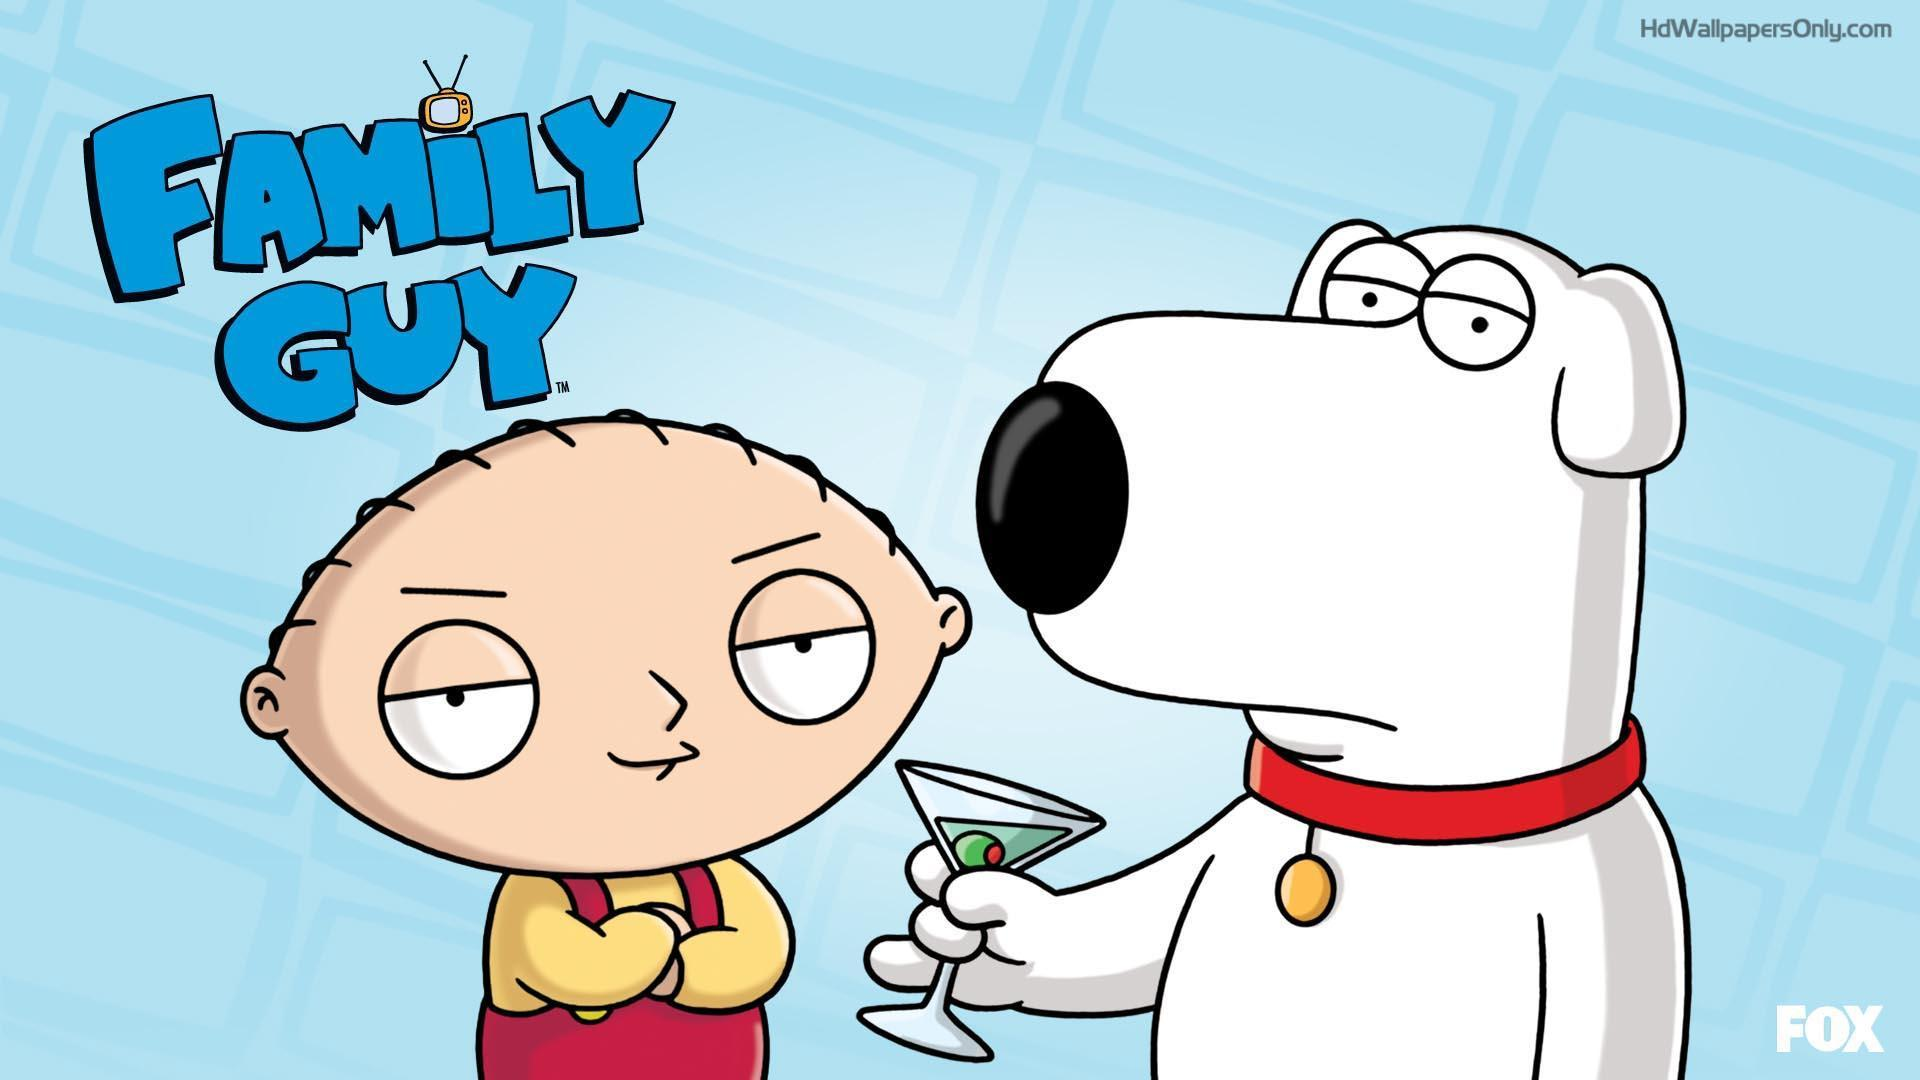 Family Guy Desktop Wallpapers Top Free Family Guy Desktop